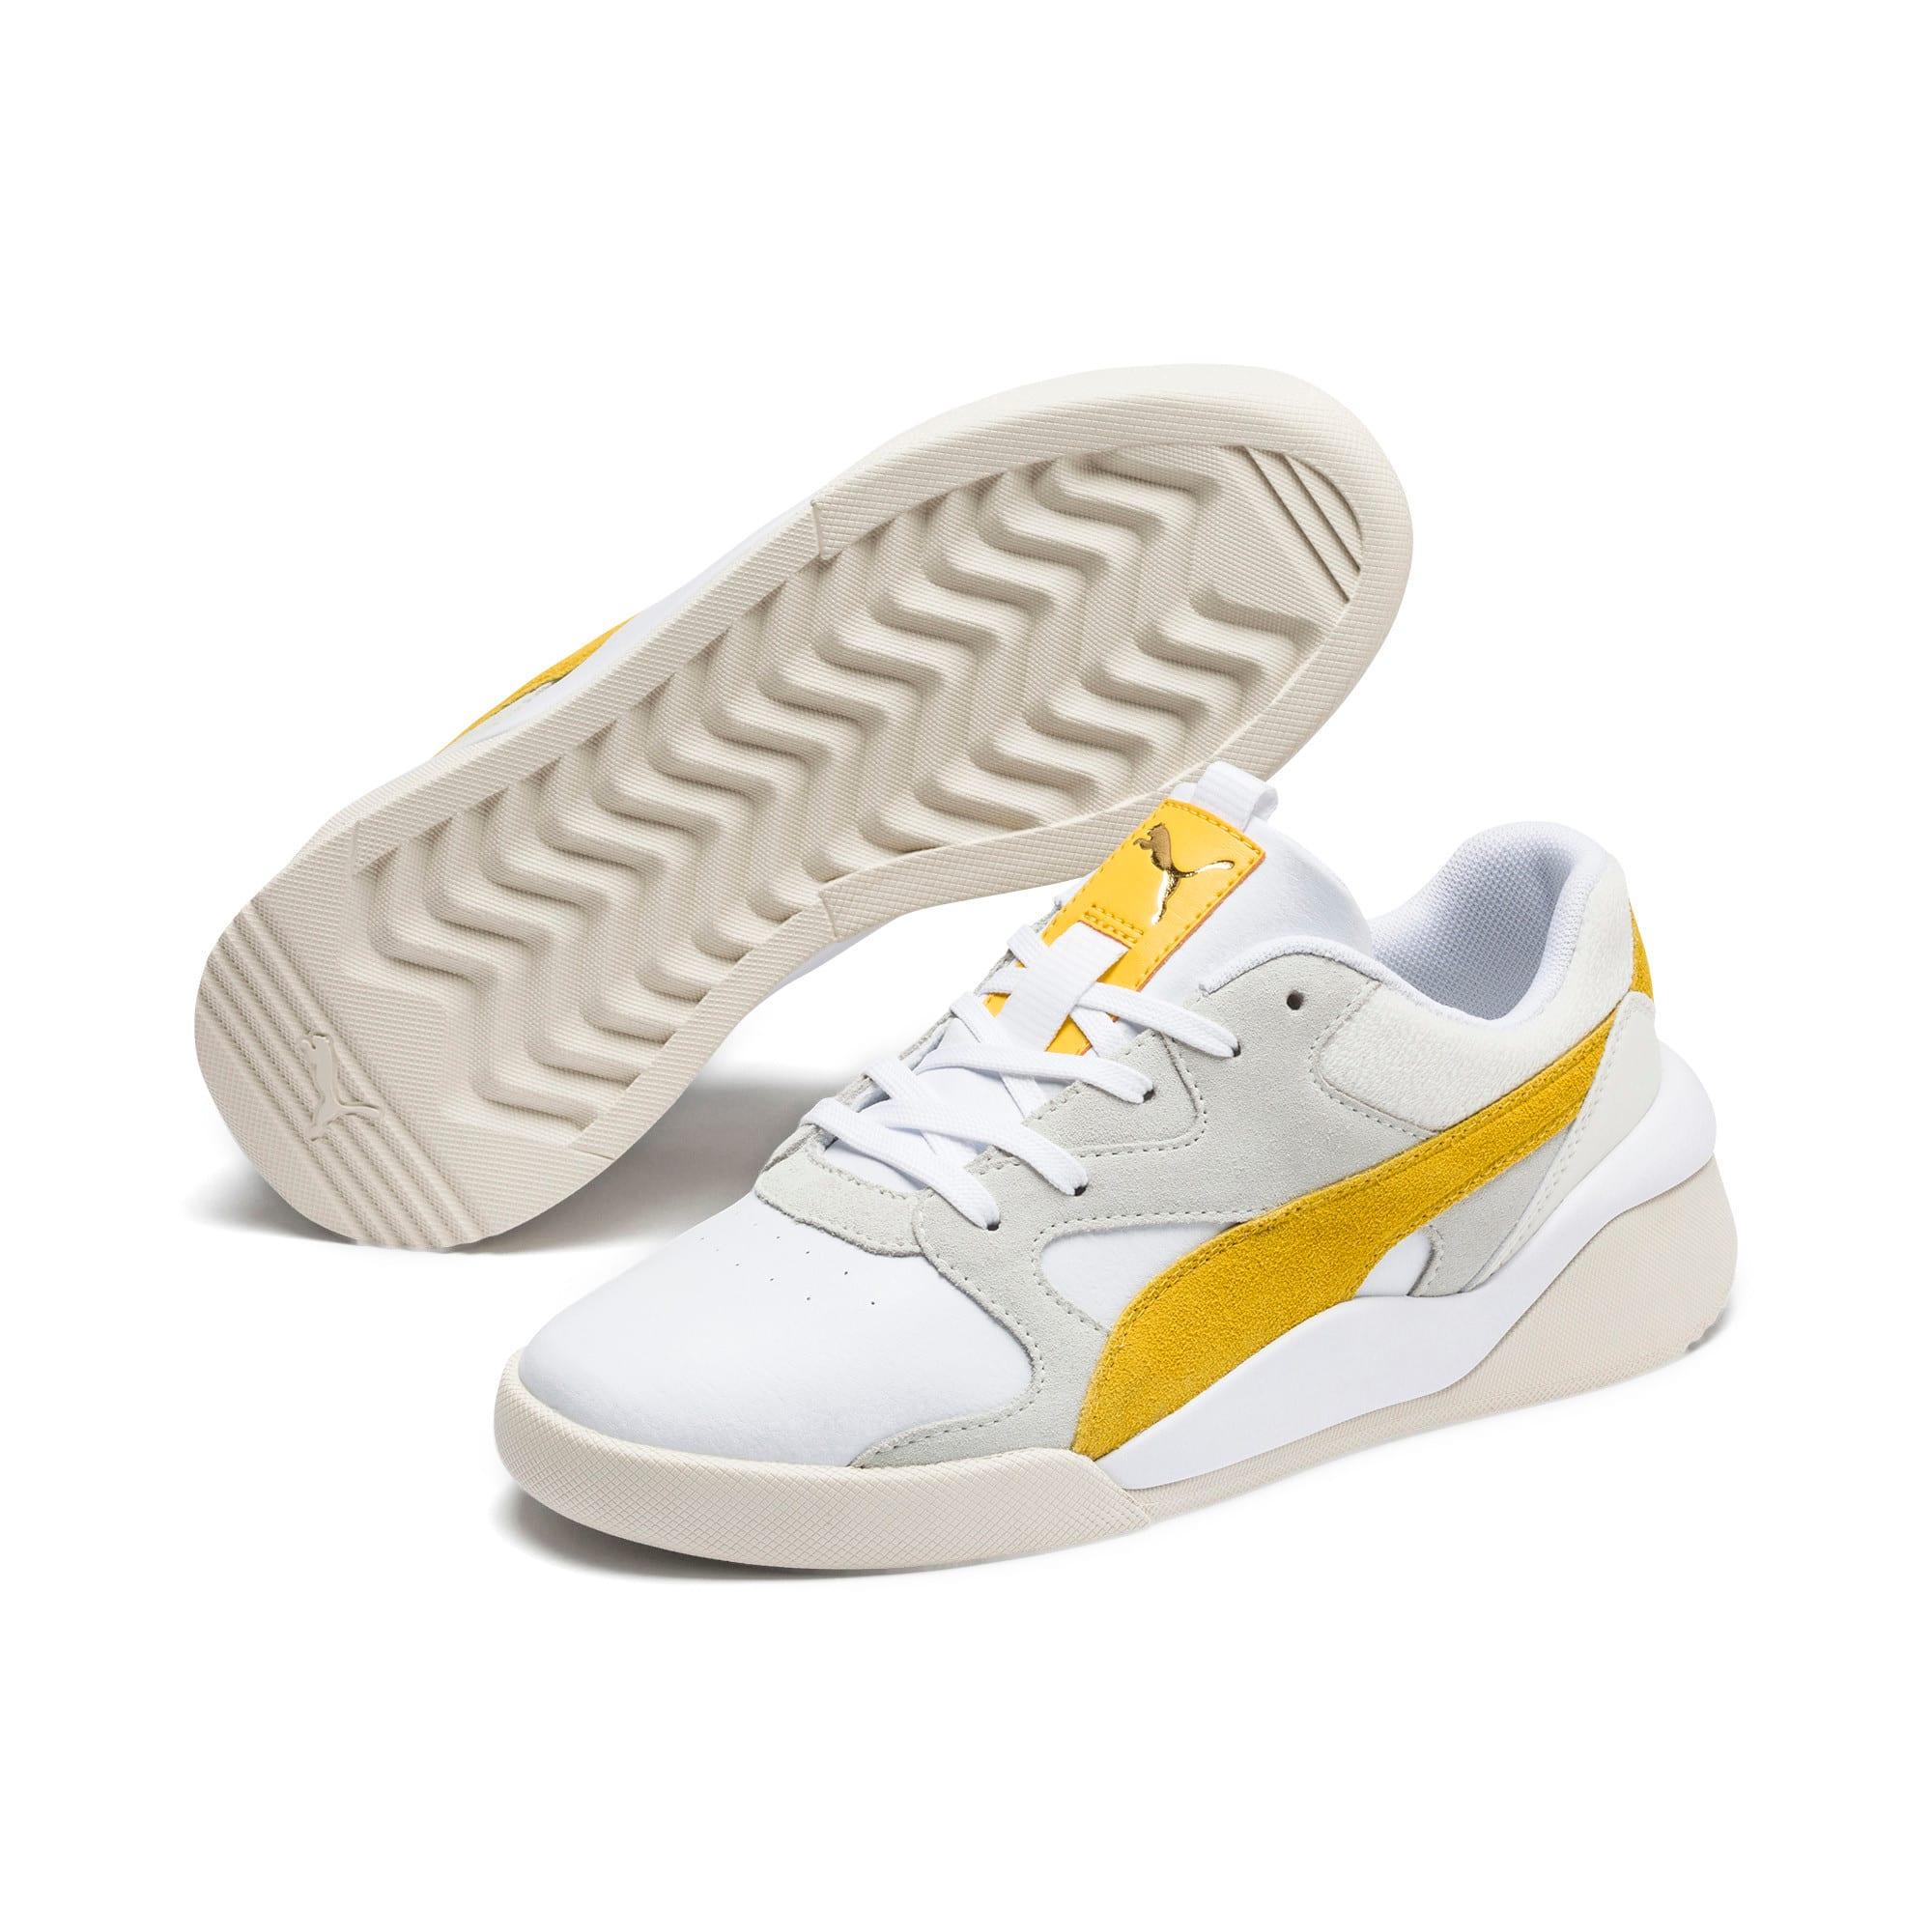 Thumbnail 3 of Aeon Heritage Women's Sneakers, Puma White-Sulphur, medium